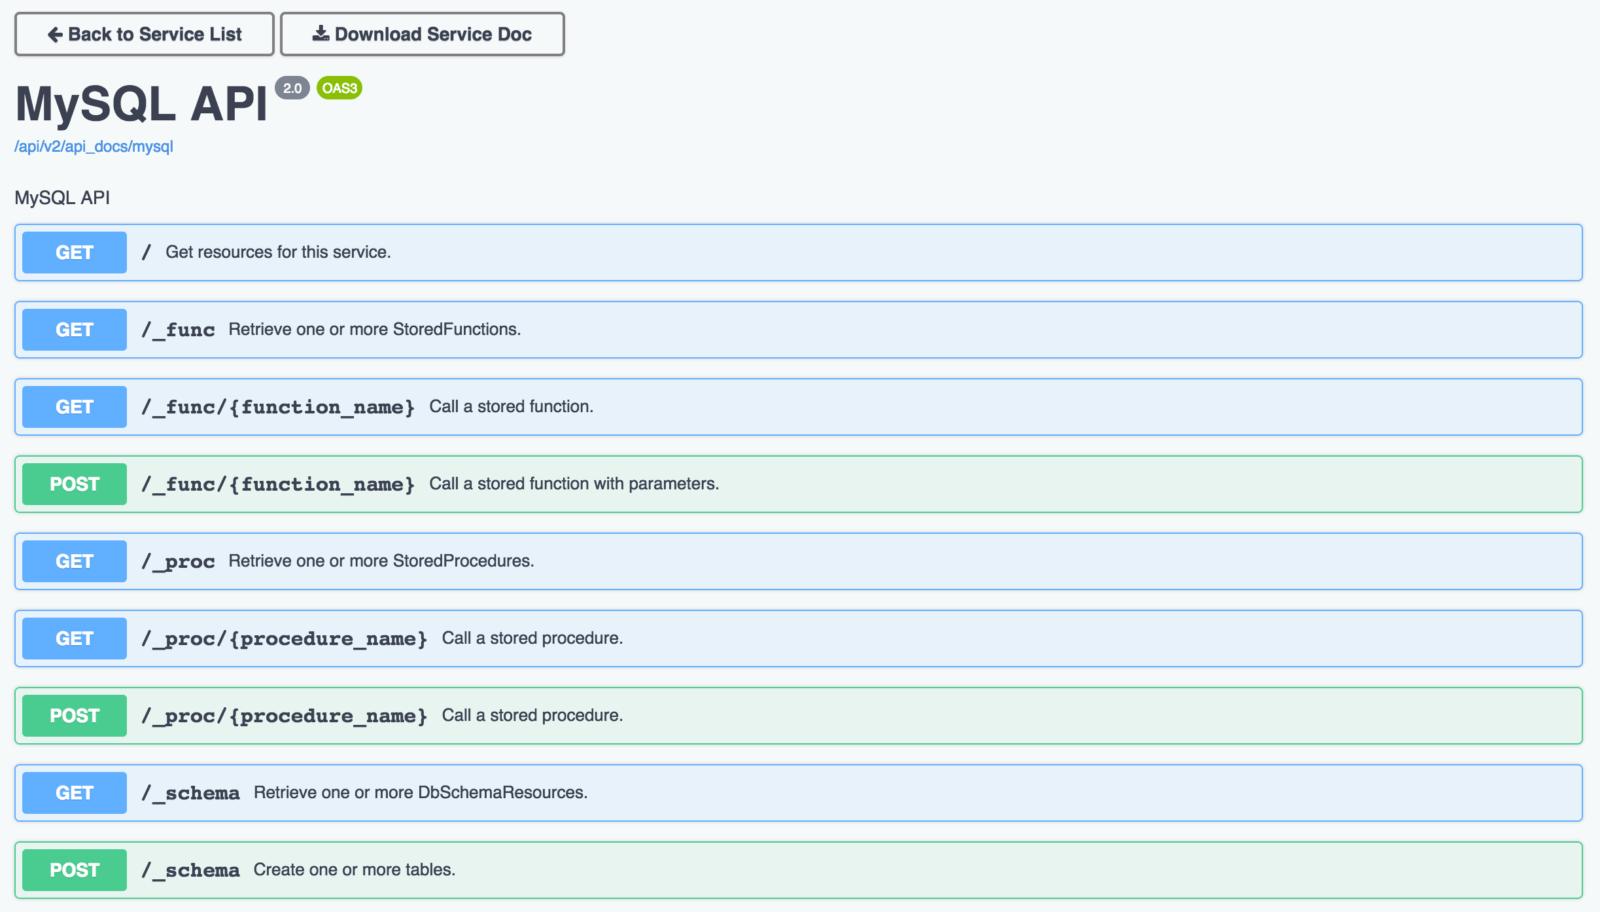 The DreamFactory API Docs interface